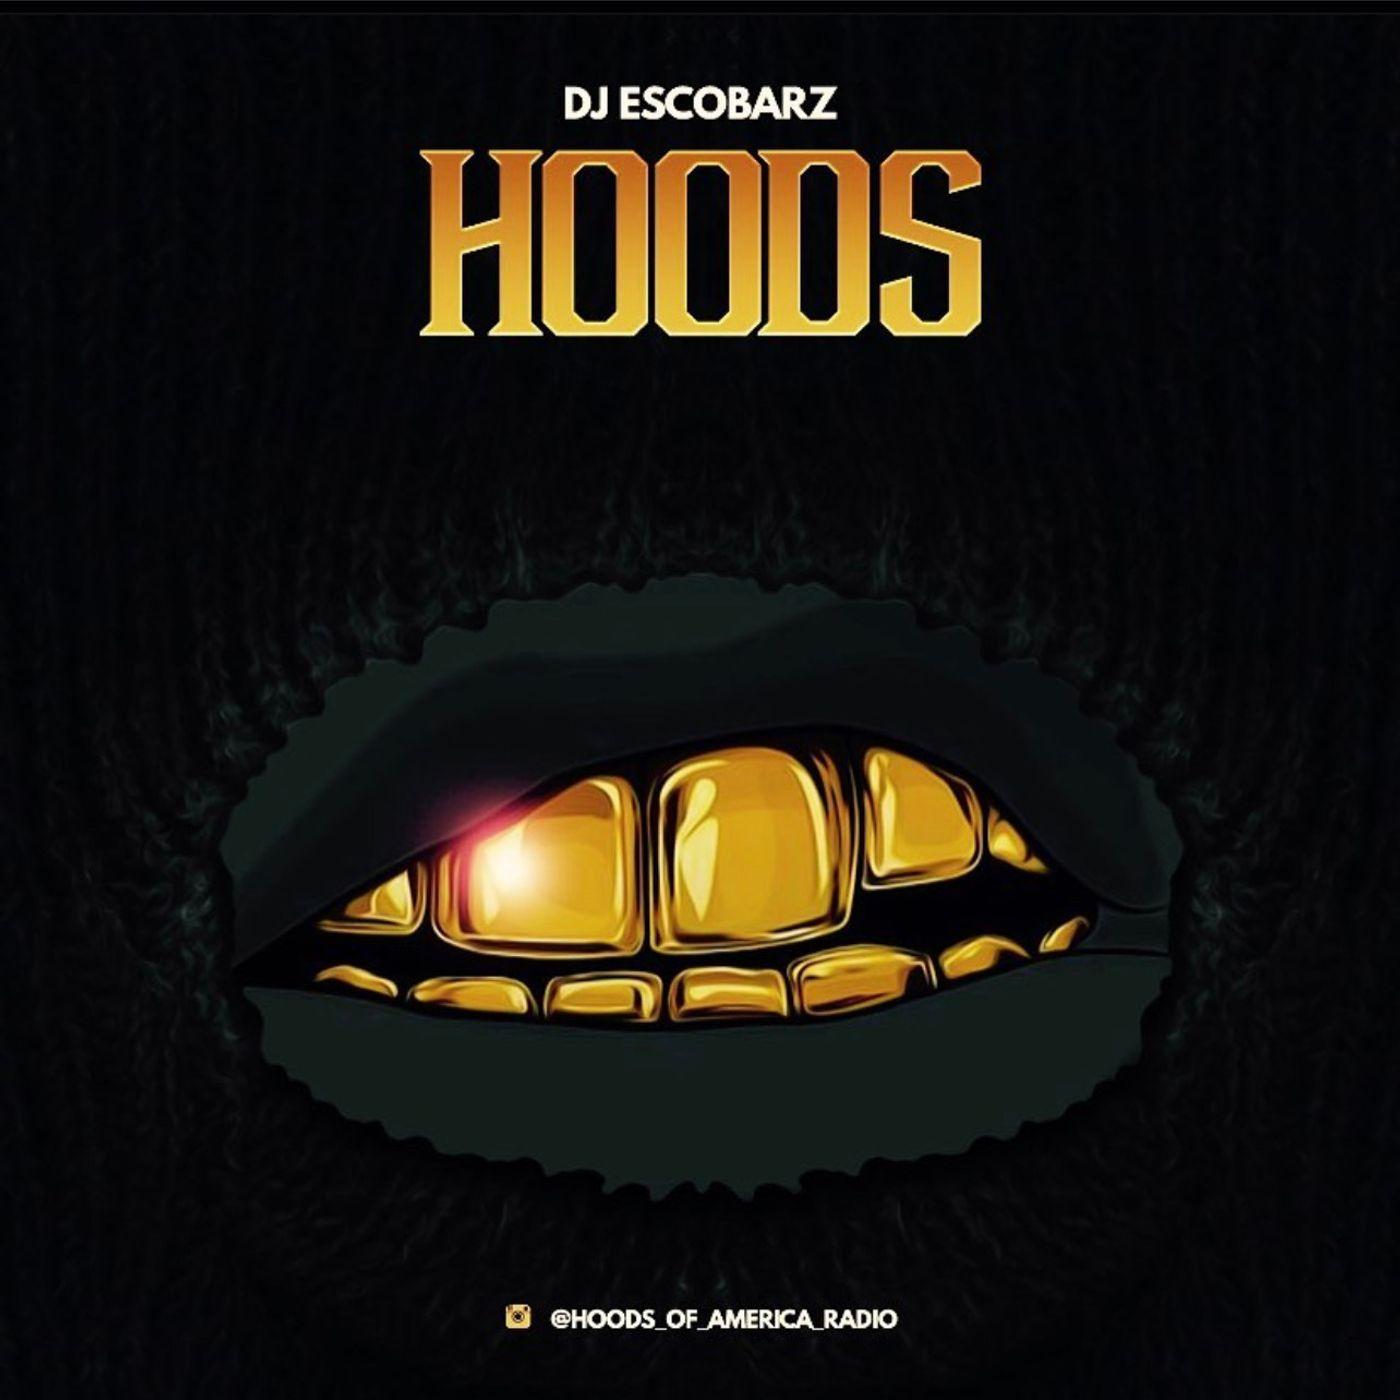 The Monday Mix Live With Dj Escobarz